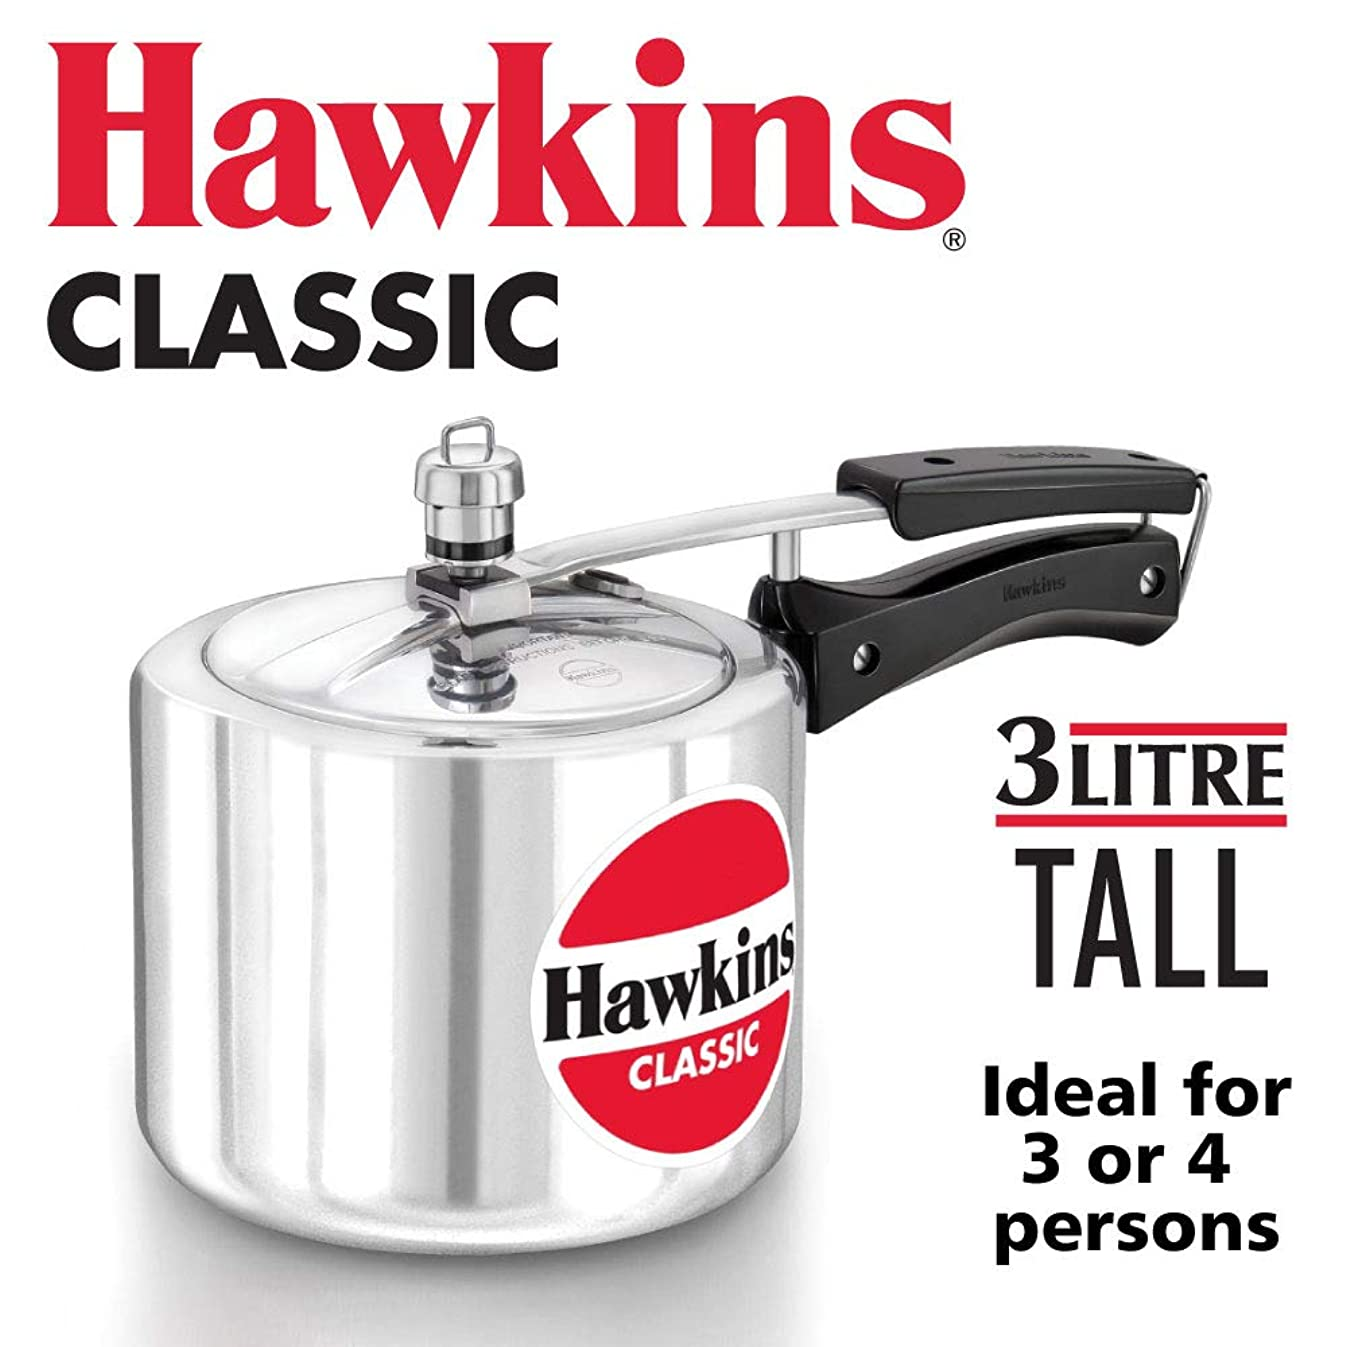 HAWKIN?Classic CL3T 3-Liter New Improved Aluminum Pressure Cooker, Small, Silver